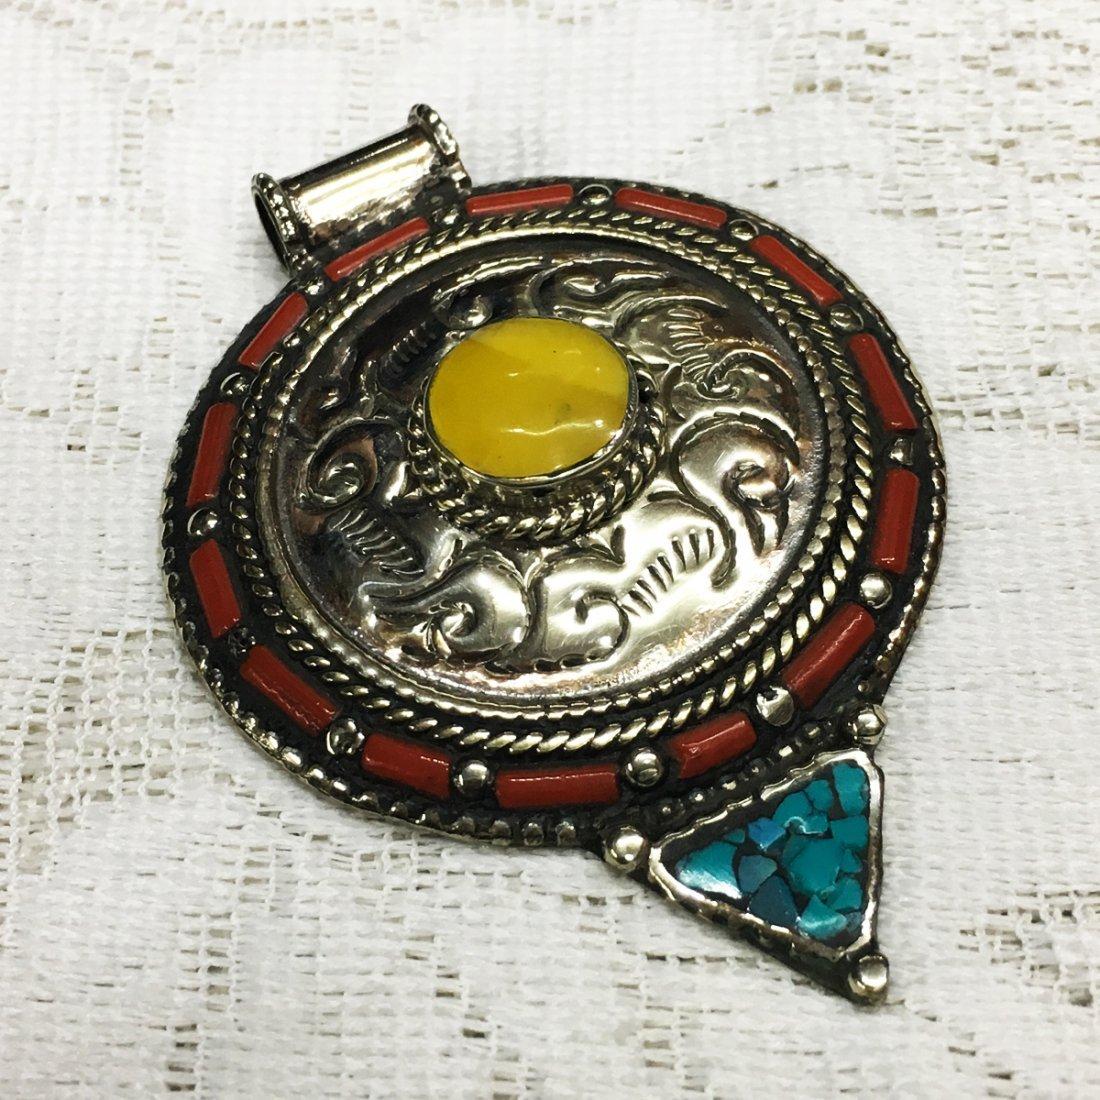 Tibetan Tribal Ethnic Tibetan Silver Amber Pendant